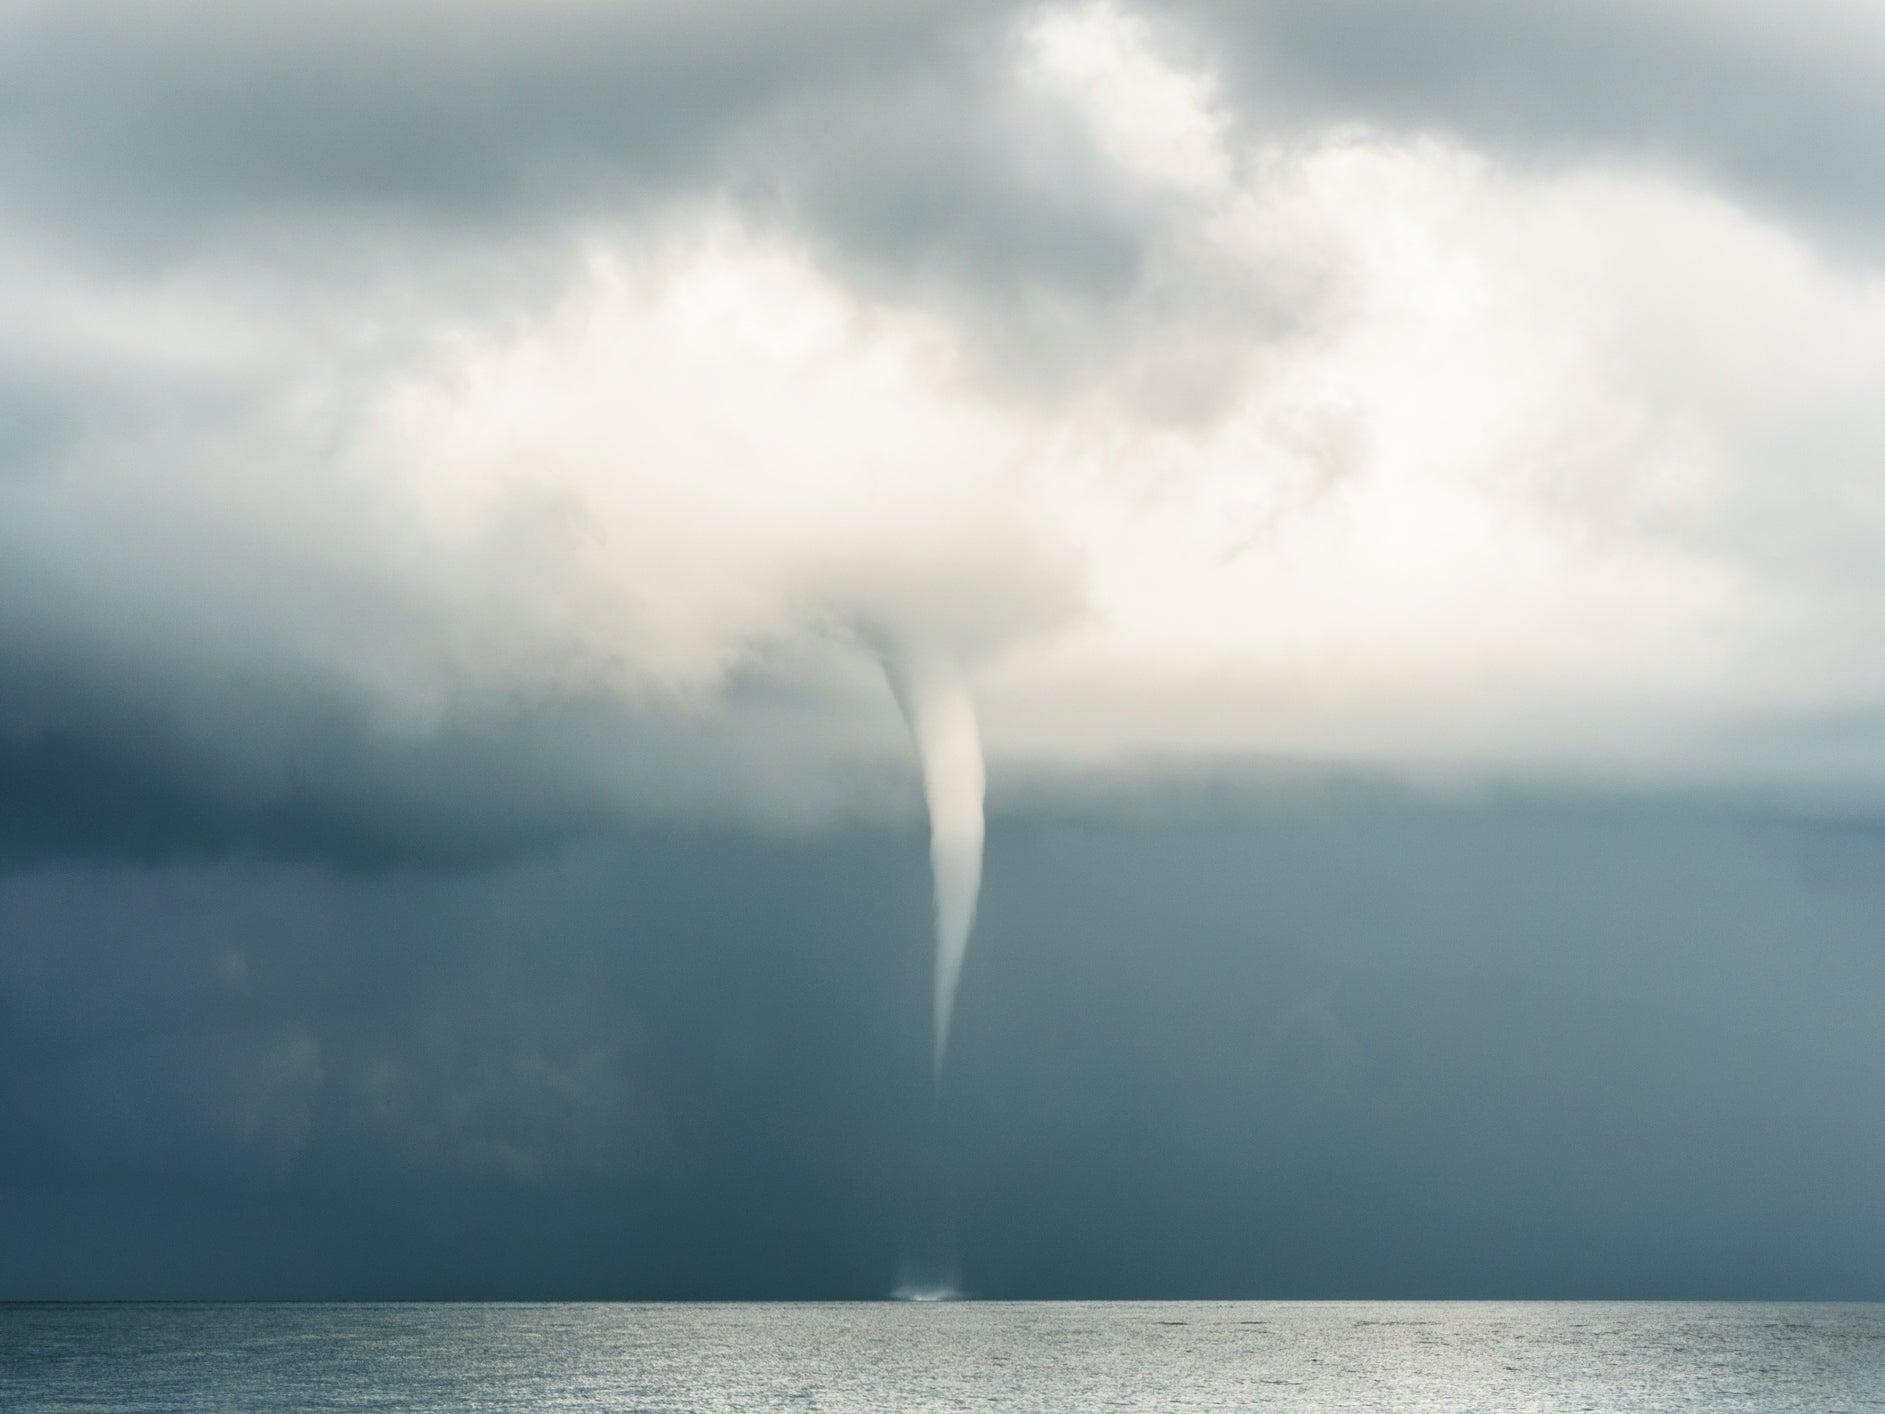 Climate change may kickstart dormant El Niño weather system in Indian Ocean